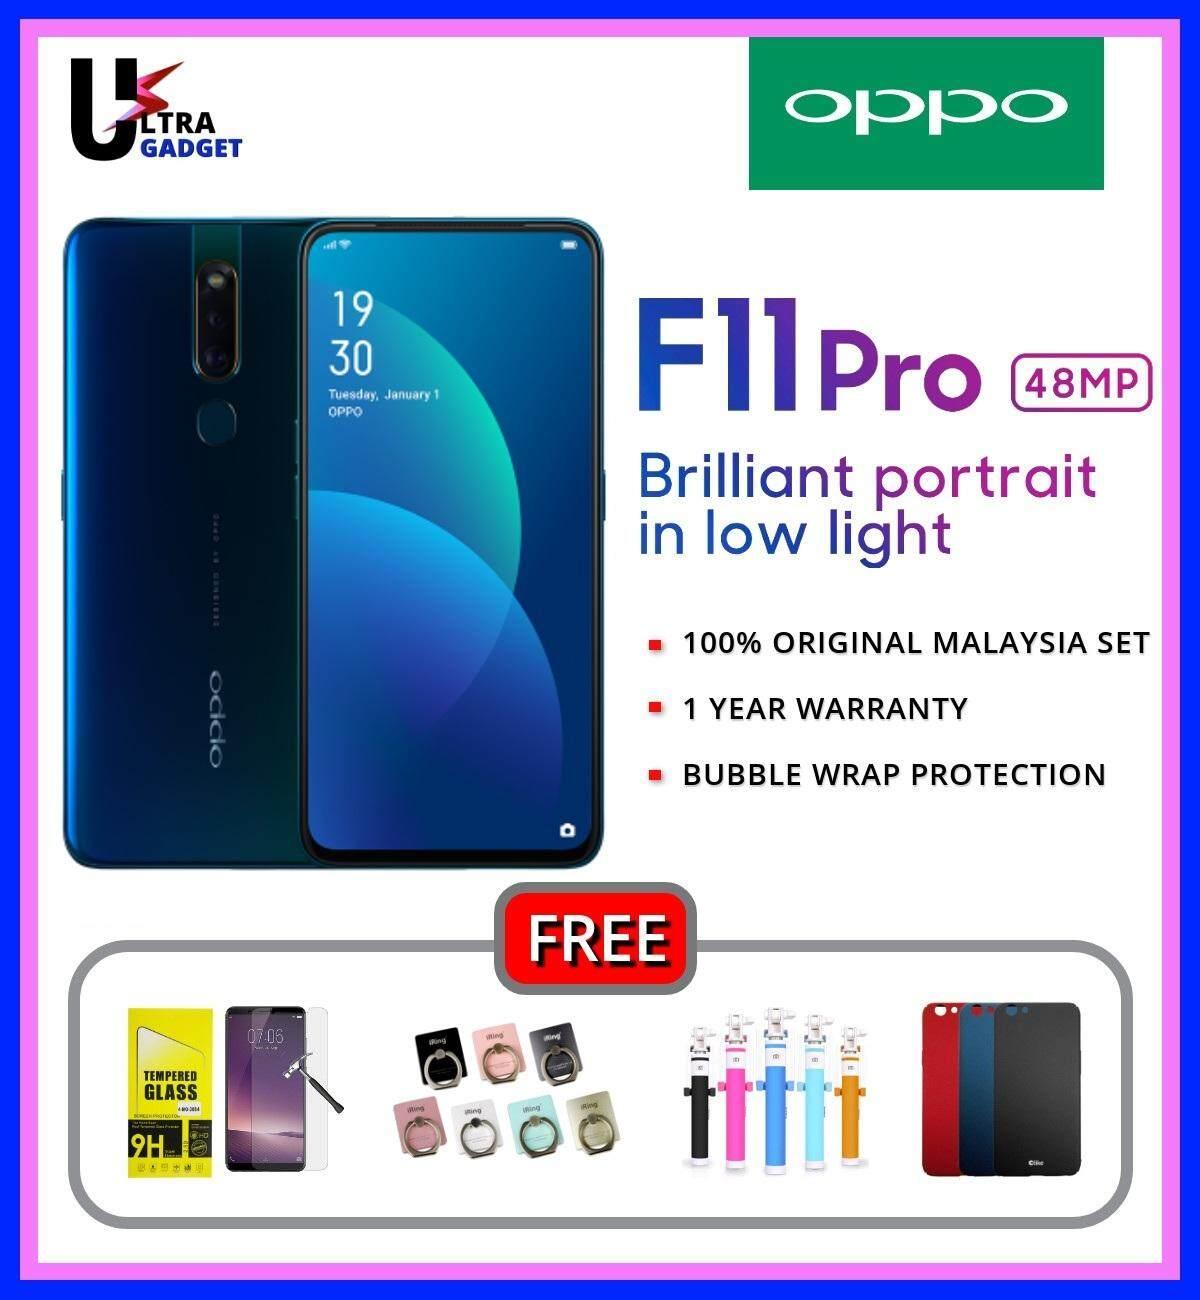 OPPO F11 Pro 6GB RAM + 128GB ROM Original Malaysia Set